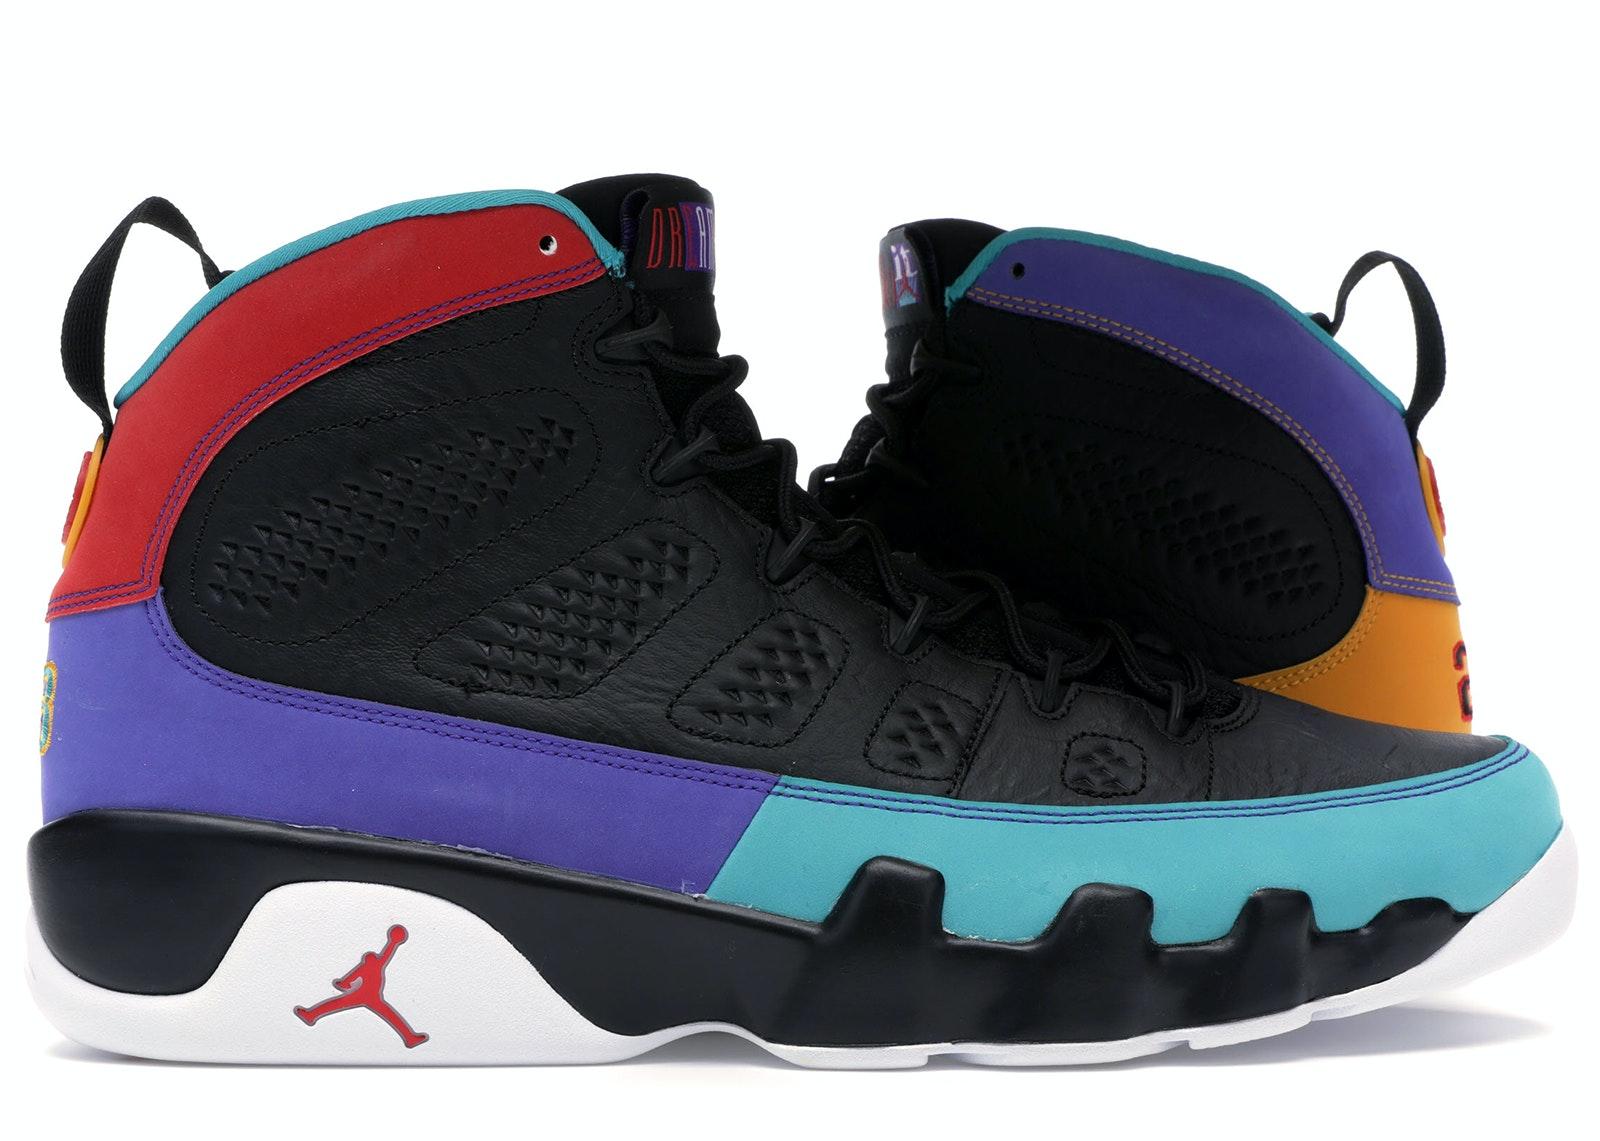 Jordan 9 Retro Dream It Do It